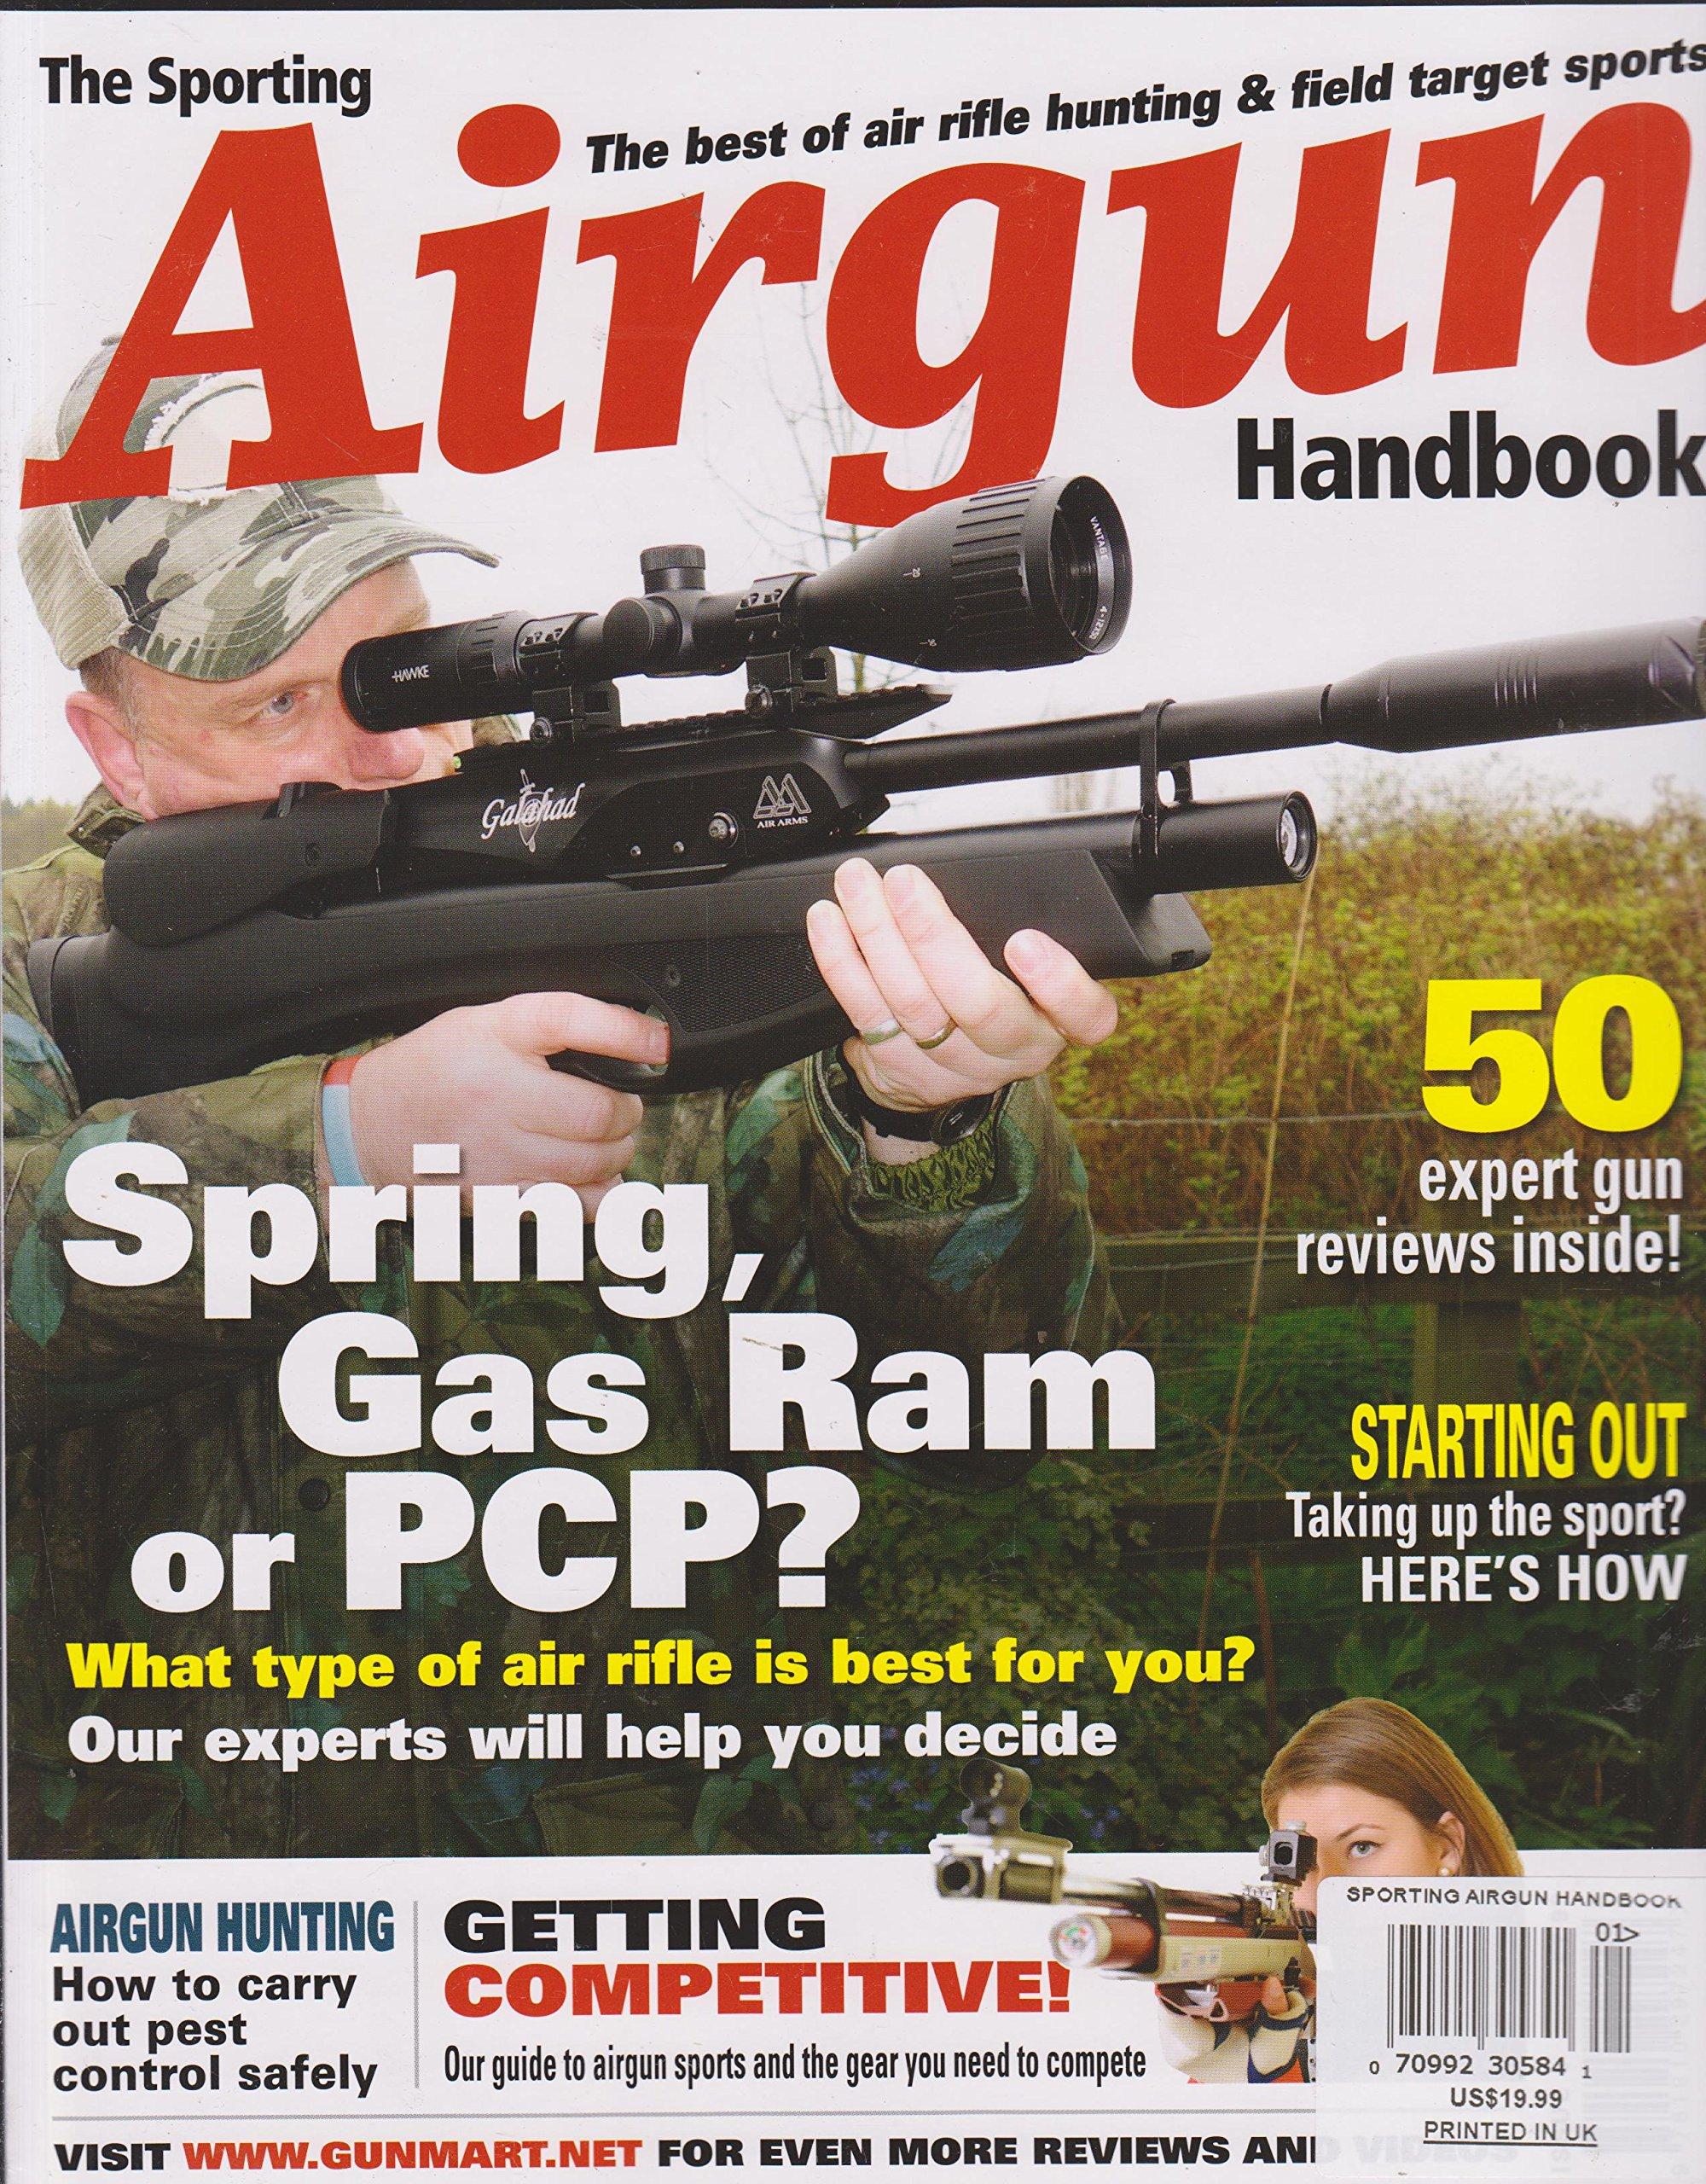 The Sporting Airgun Handbook Magazine Issue 9 PDF